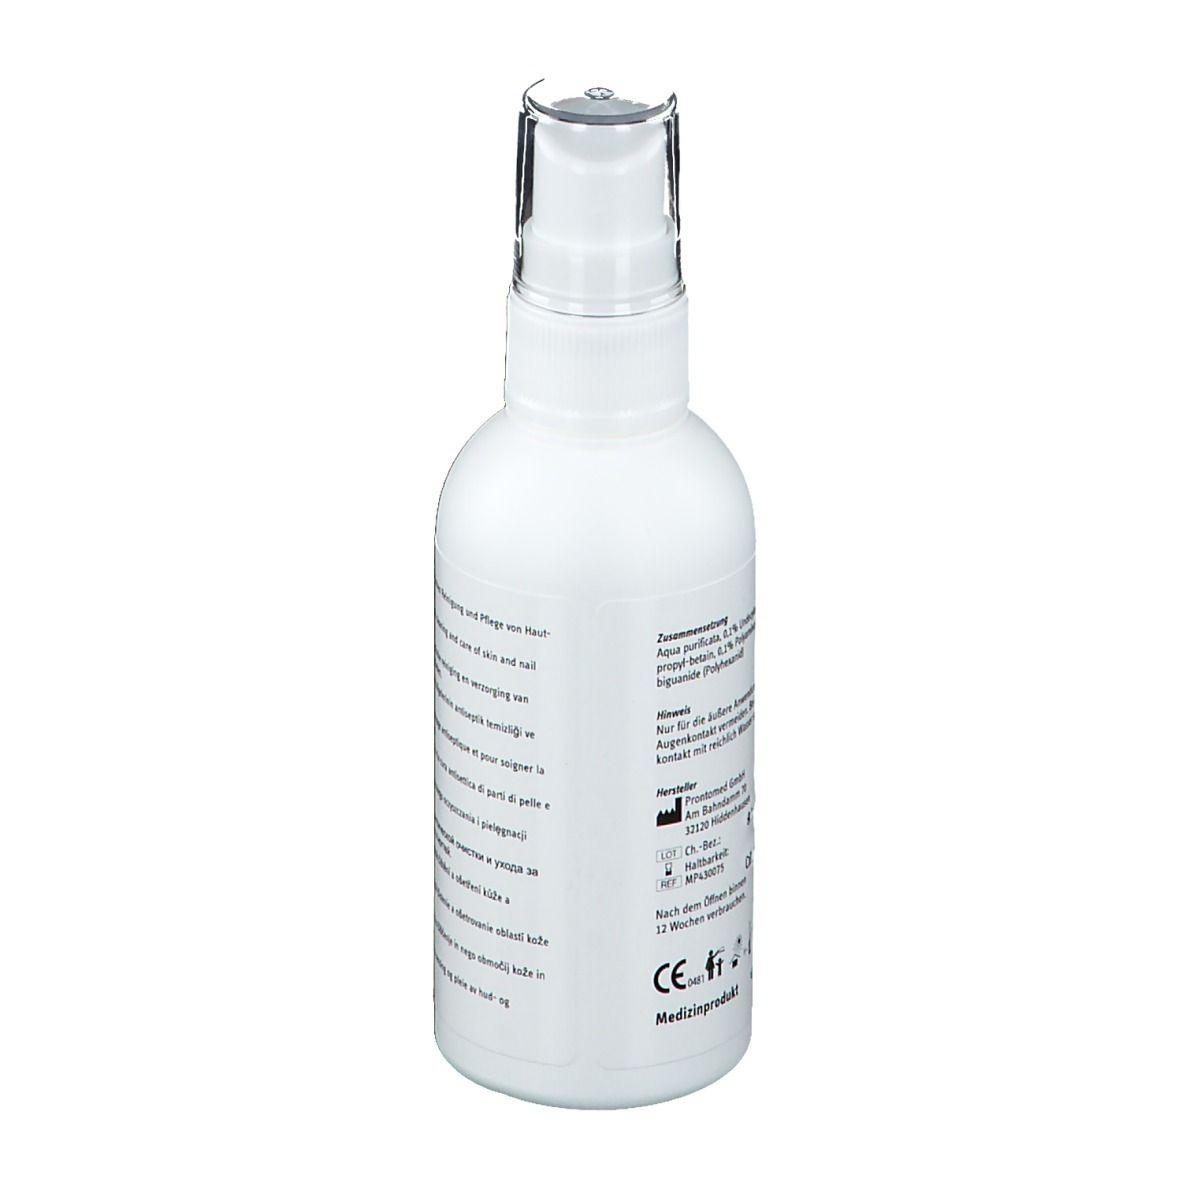 ProntoMan® Fusspflege Spray